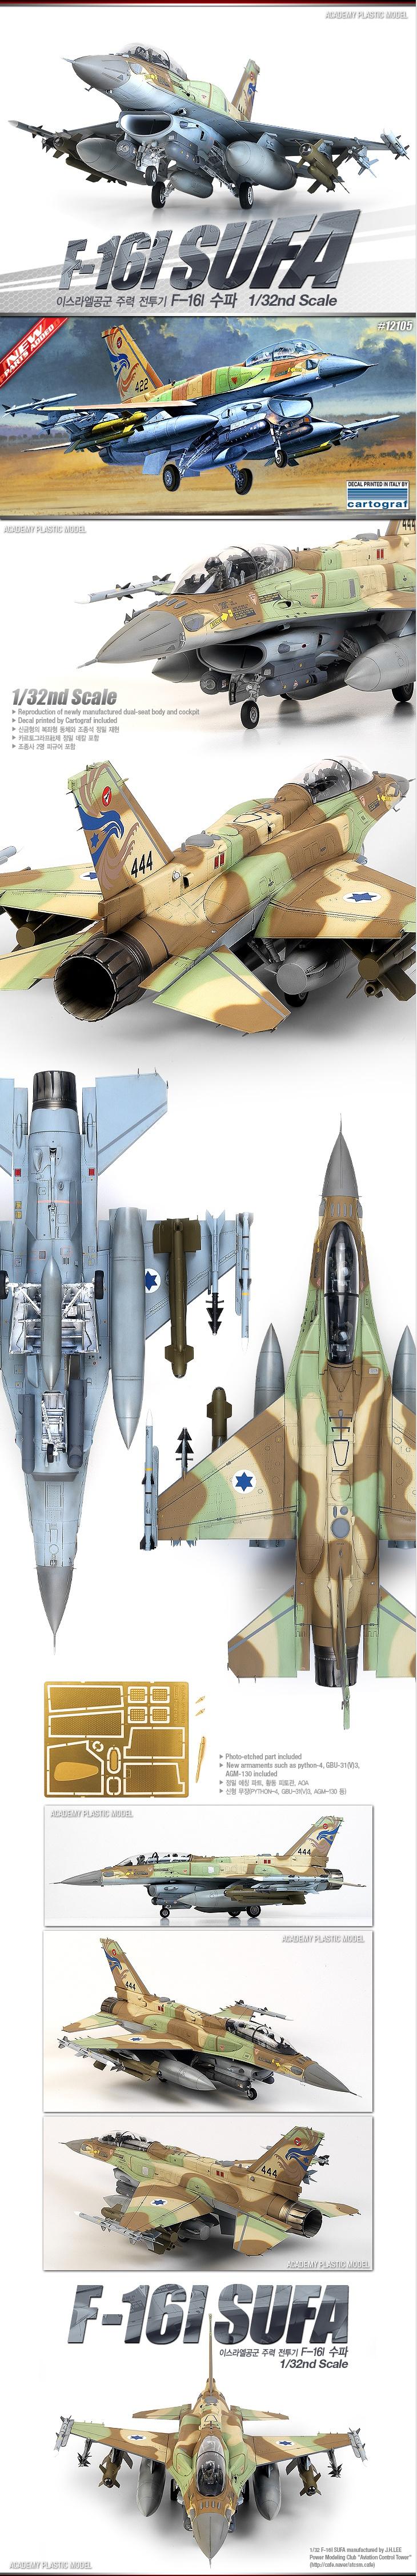 Academy 1/32 F-16I SUFA #12105 - Plastic Model Kit